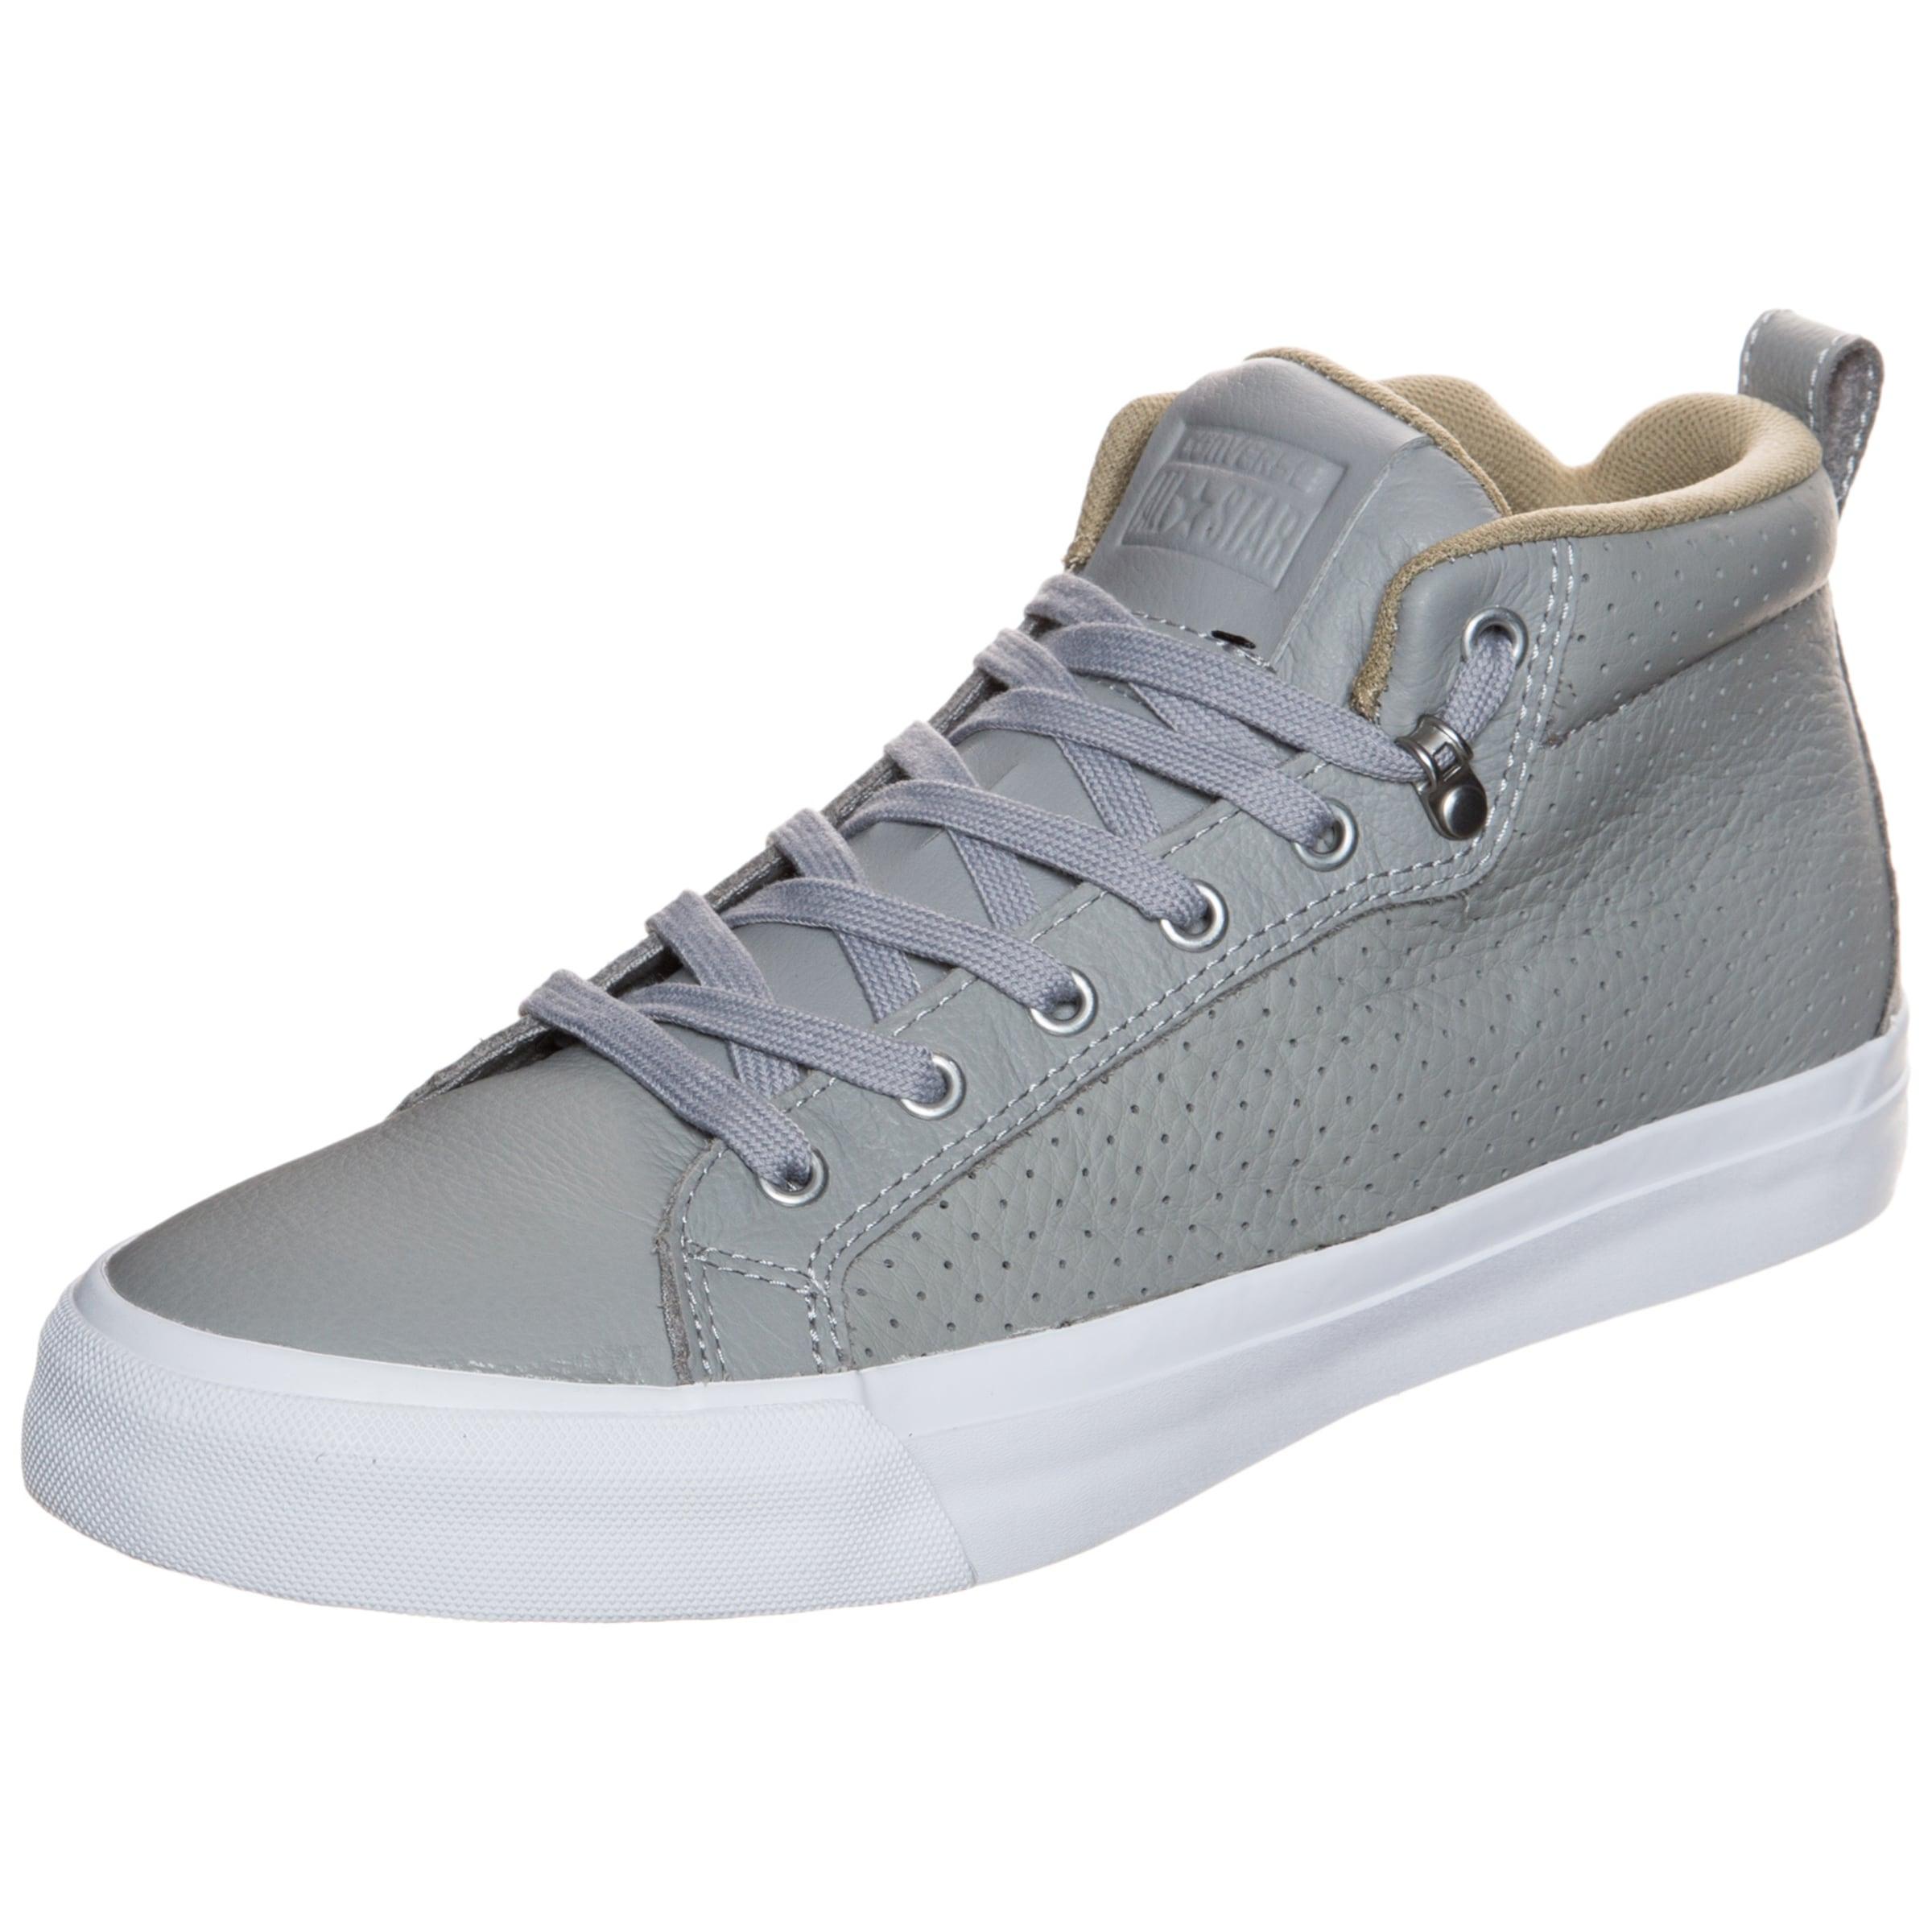 CONVERSE All Star Fulton Mid Sneaker